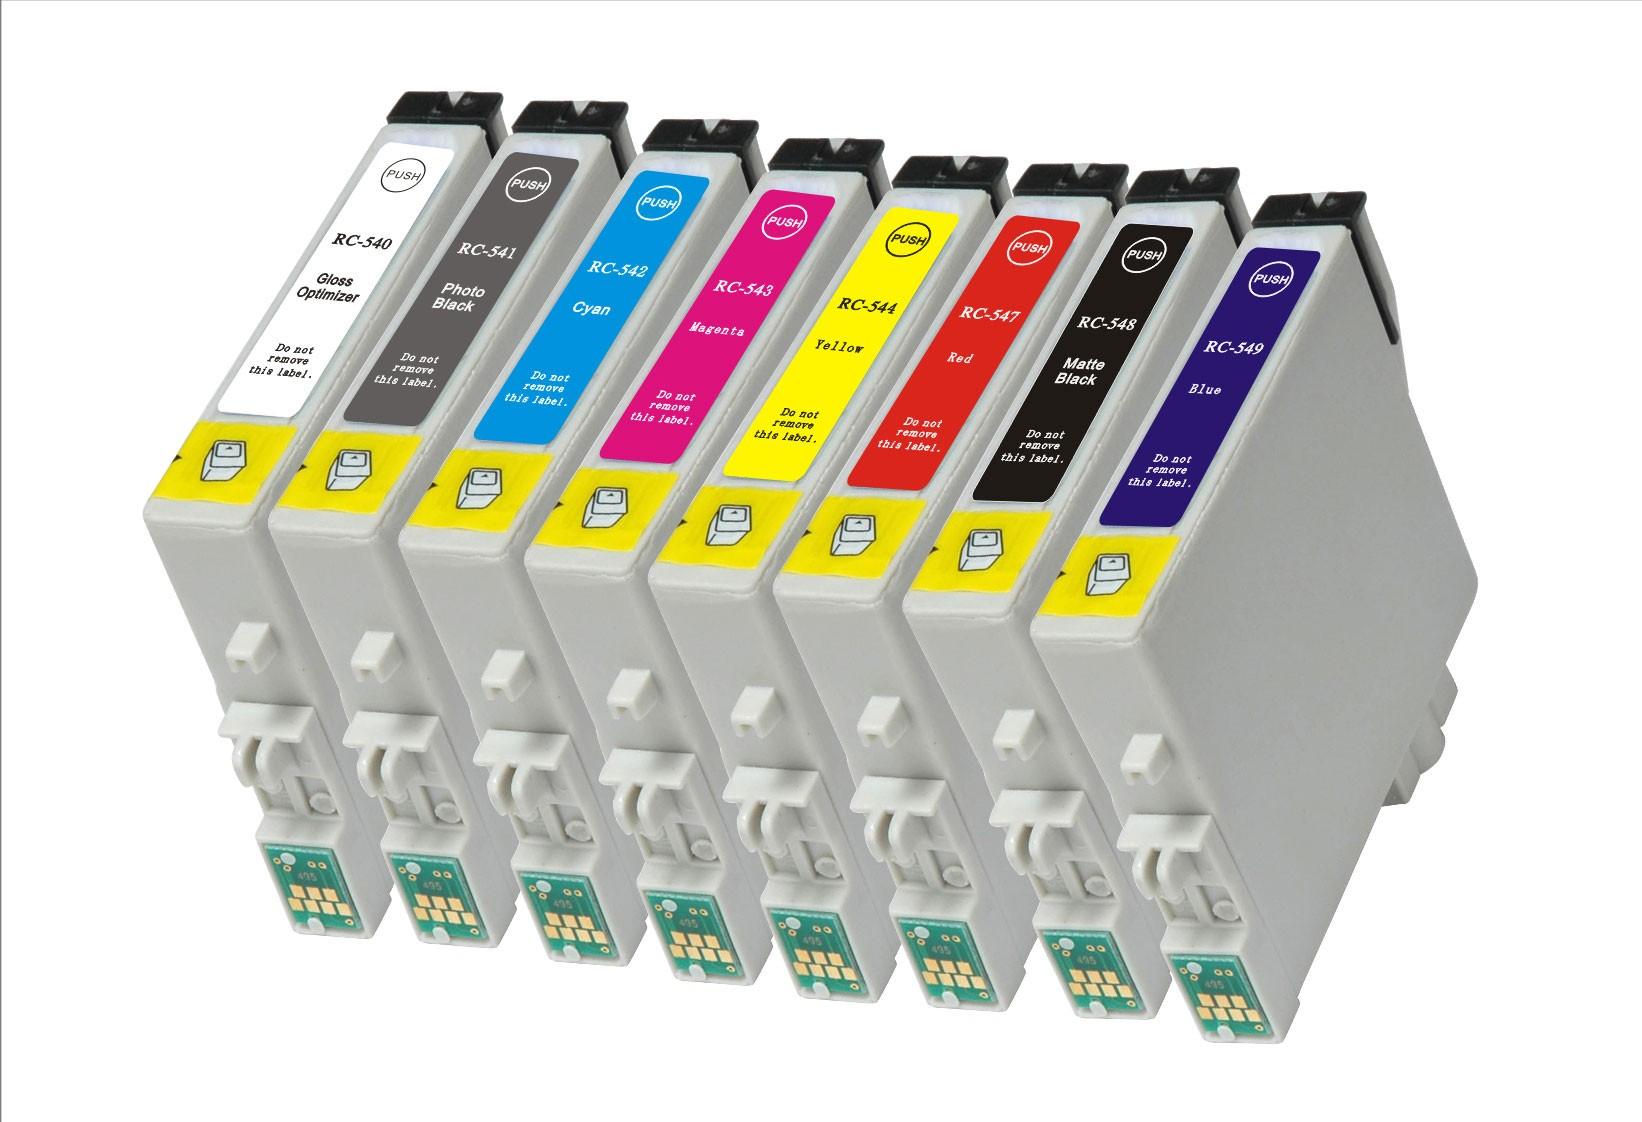 Compatible Epson T0540/T0541/T0542/T0543/T0544/T0547/T0548/T0549 a Set of 8  Ink cartridges